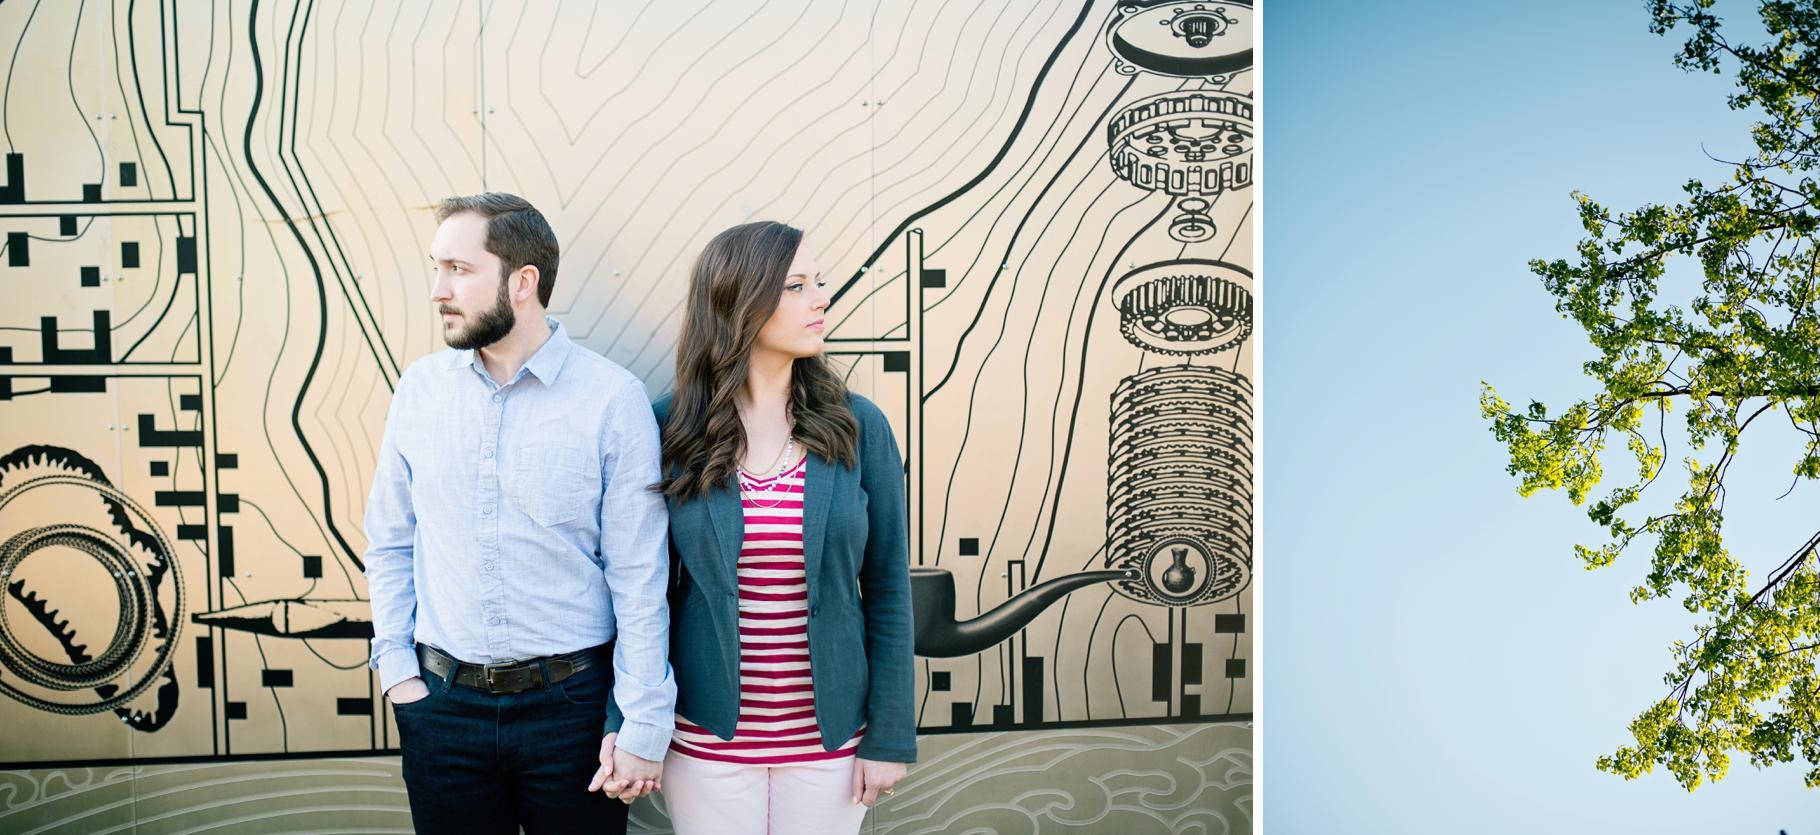 5-Melinda-Tom-Engaged-Seattle-Waterfront-Myrtle-Edwards-Park-Urban-Industrial-Elliot-Bay-Trail-Enagement-Photographer-Wedding-Photography-by-Betty-Elaine